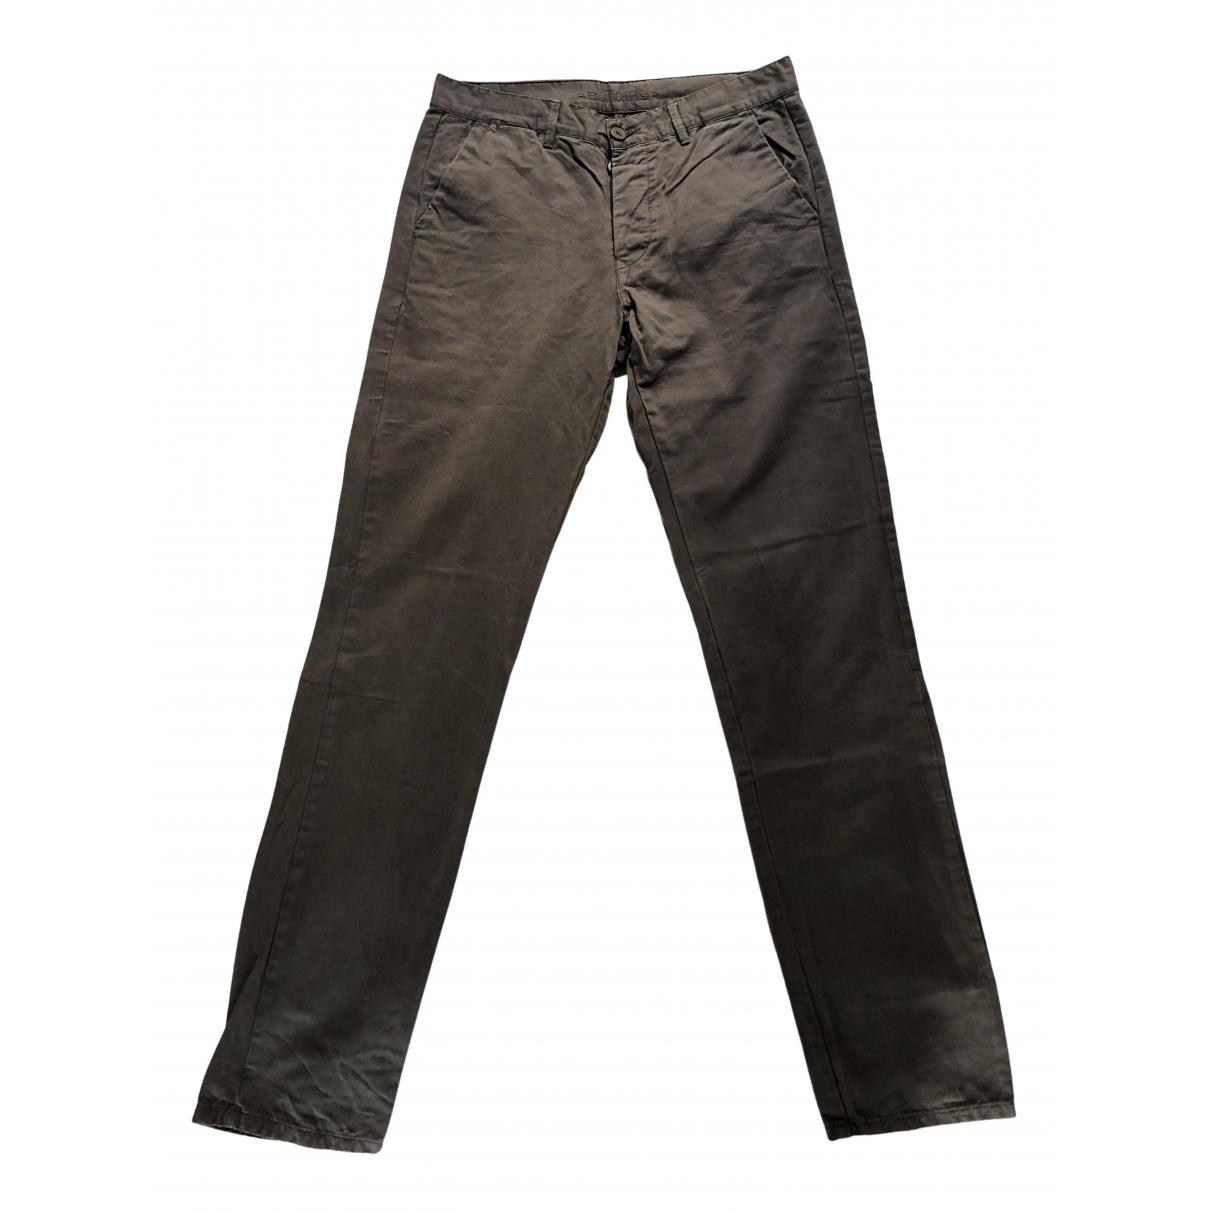 Balibaris N Grey Cotton Trousers for Men 32 UK - US